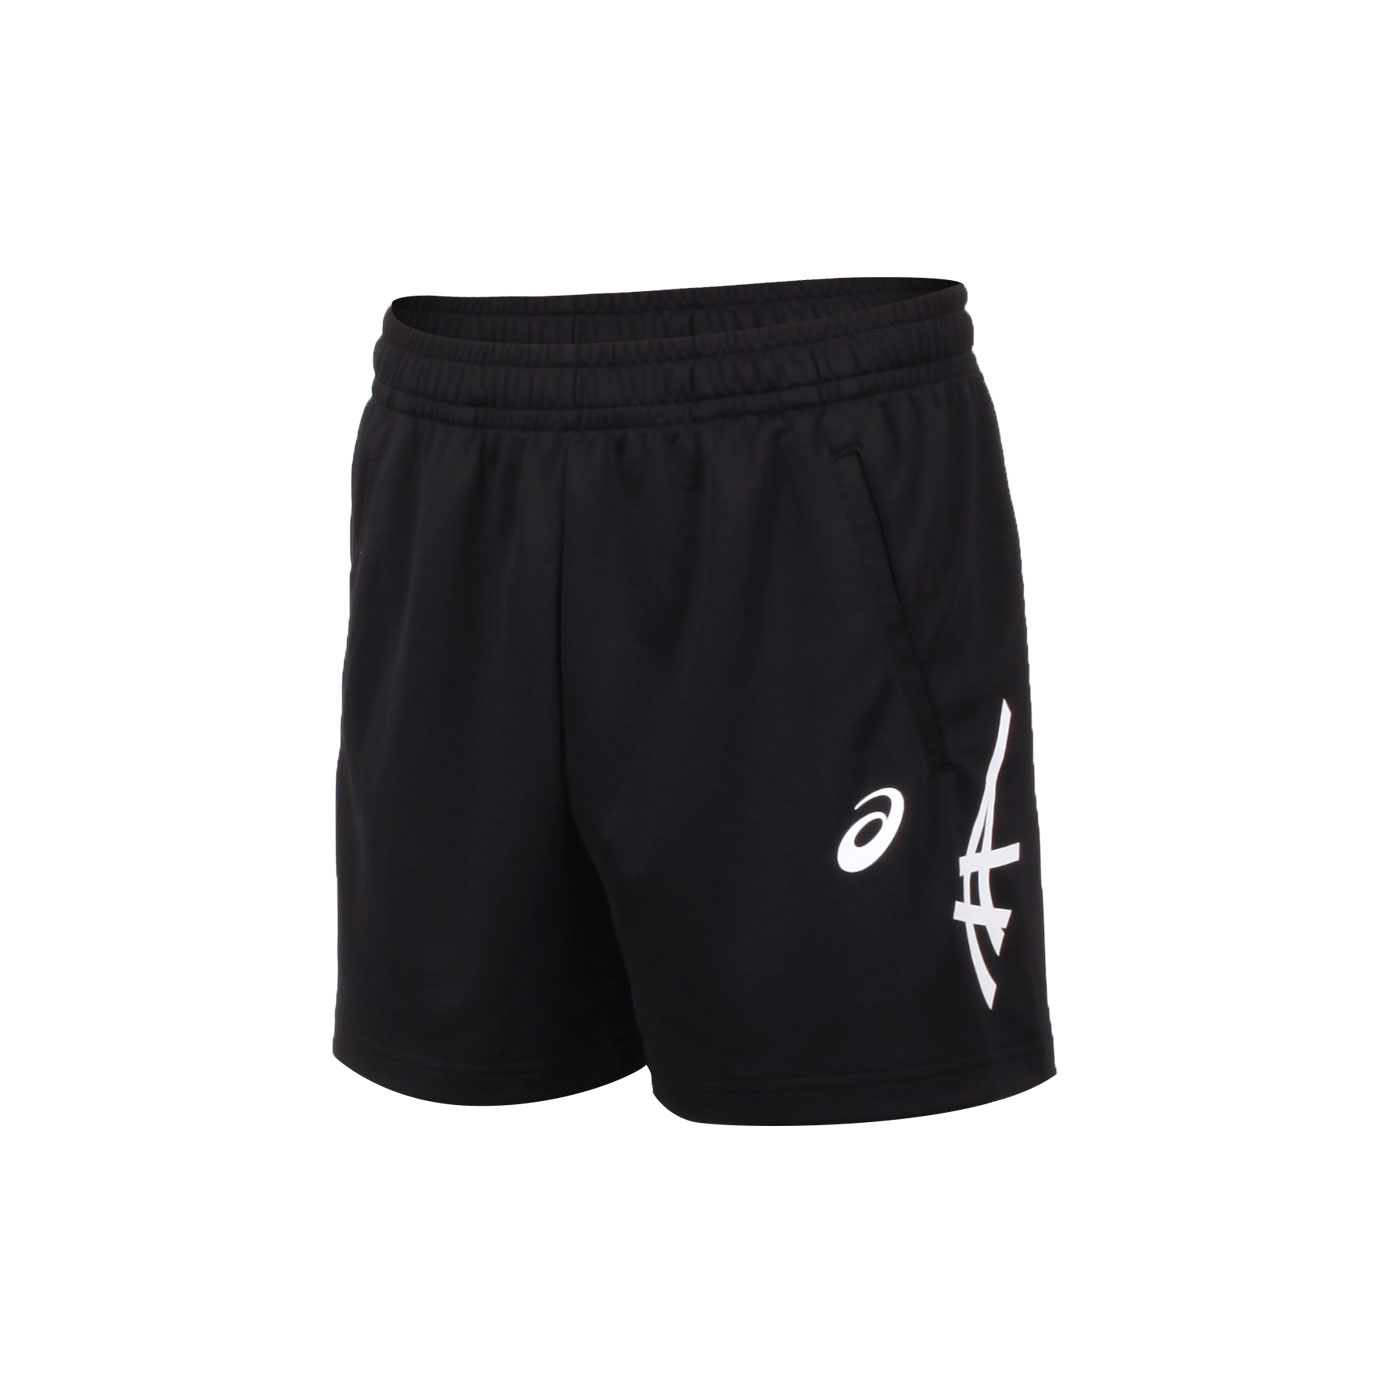 ASICS 男款短版球褲 2053A138-001 - 黑白